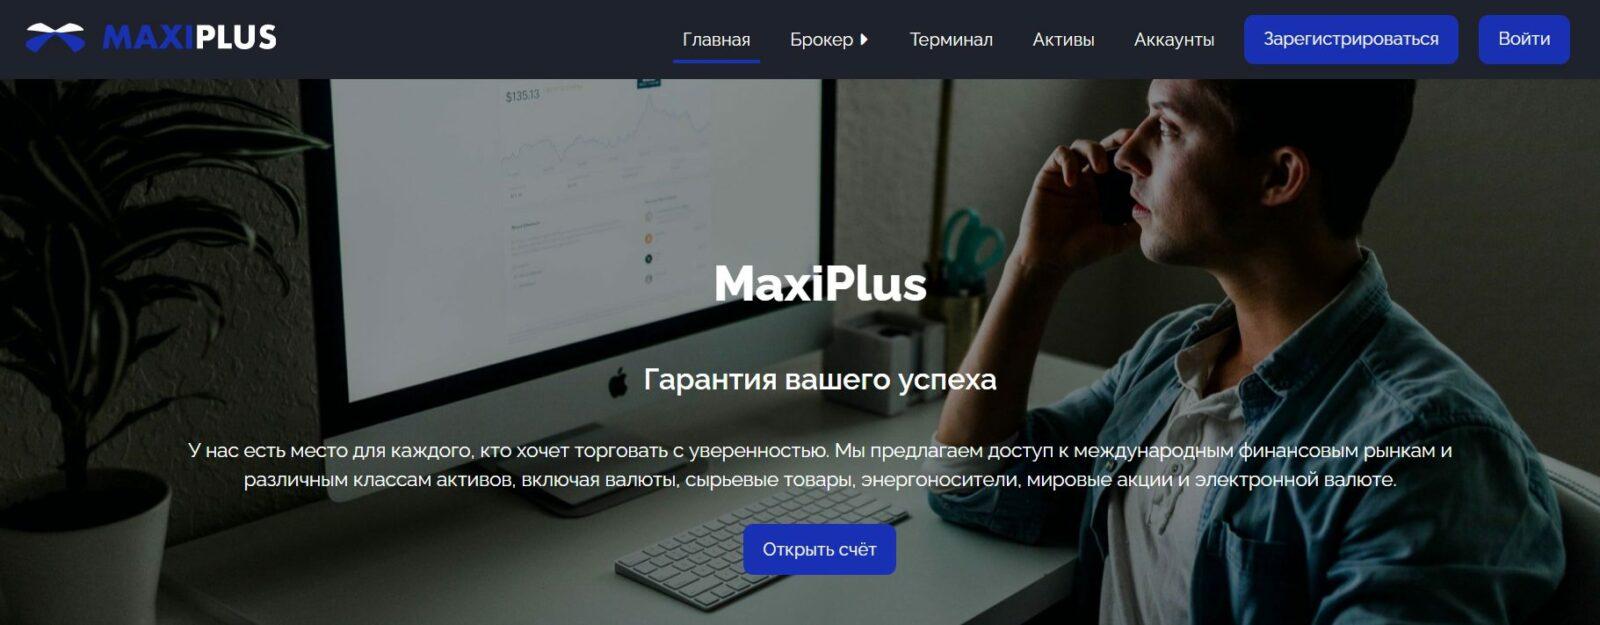 Компания MaxiPlus.Trade